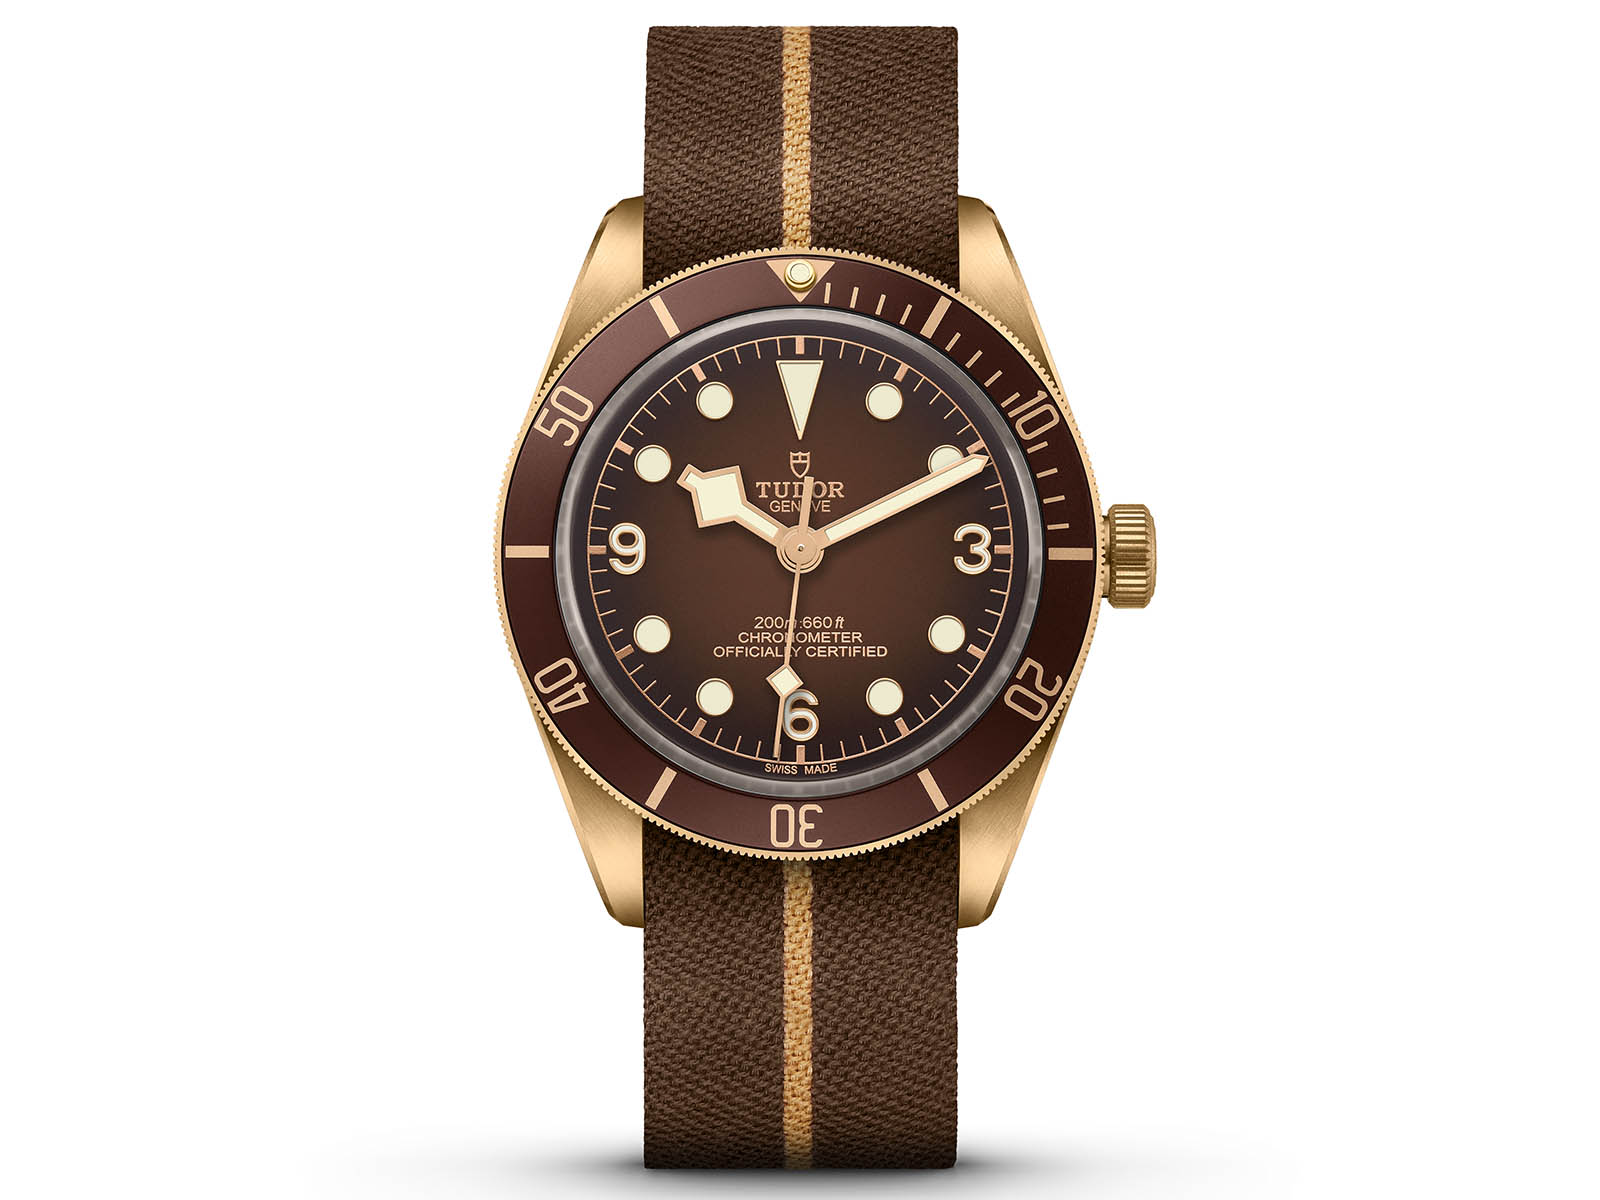 m79012m-0001-tudor-black-bay-fifty-eight-bronze-boutique-edition-10.jpg